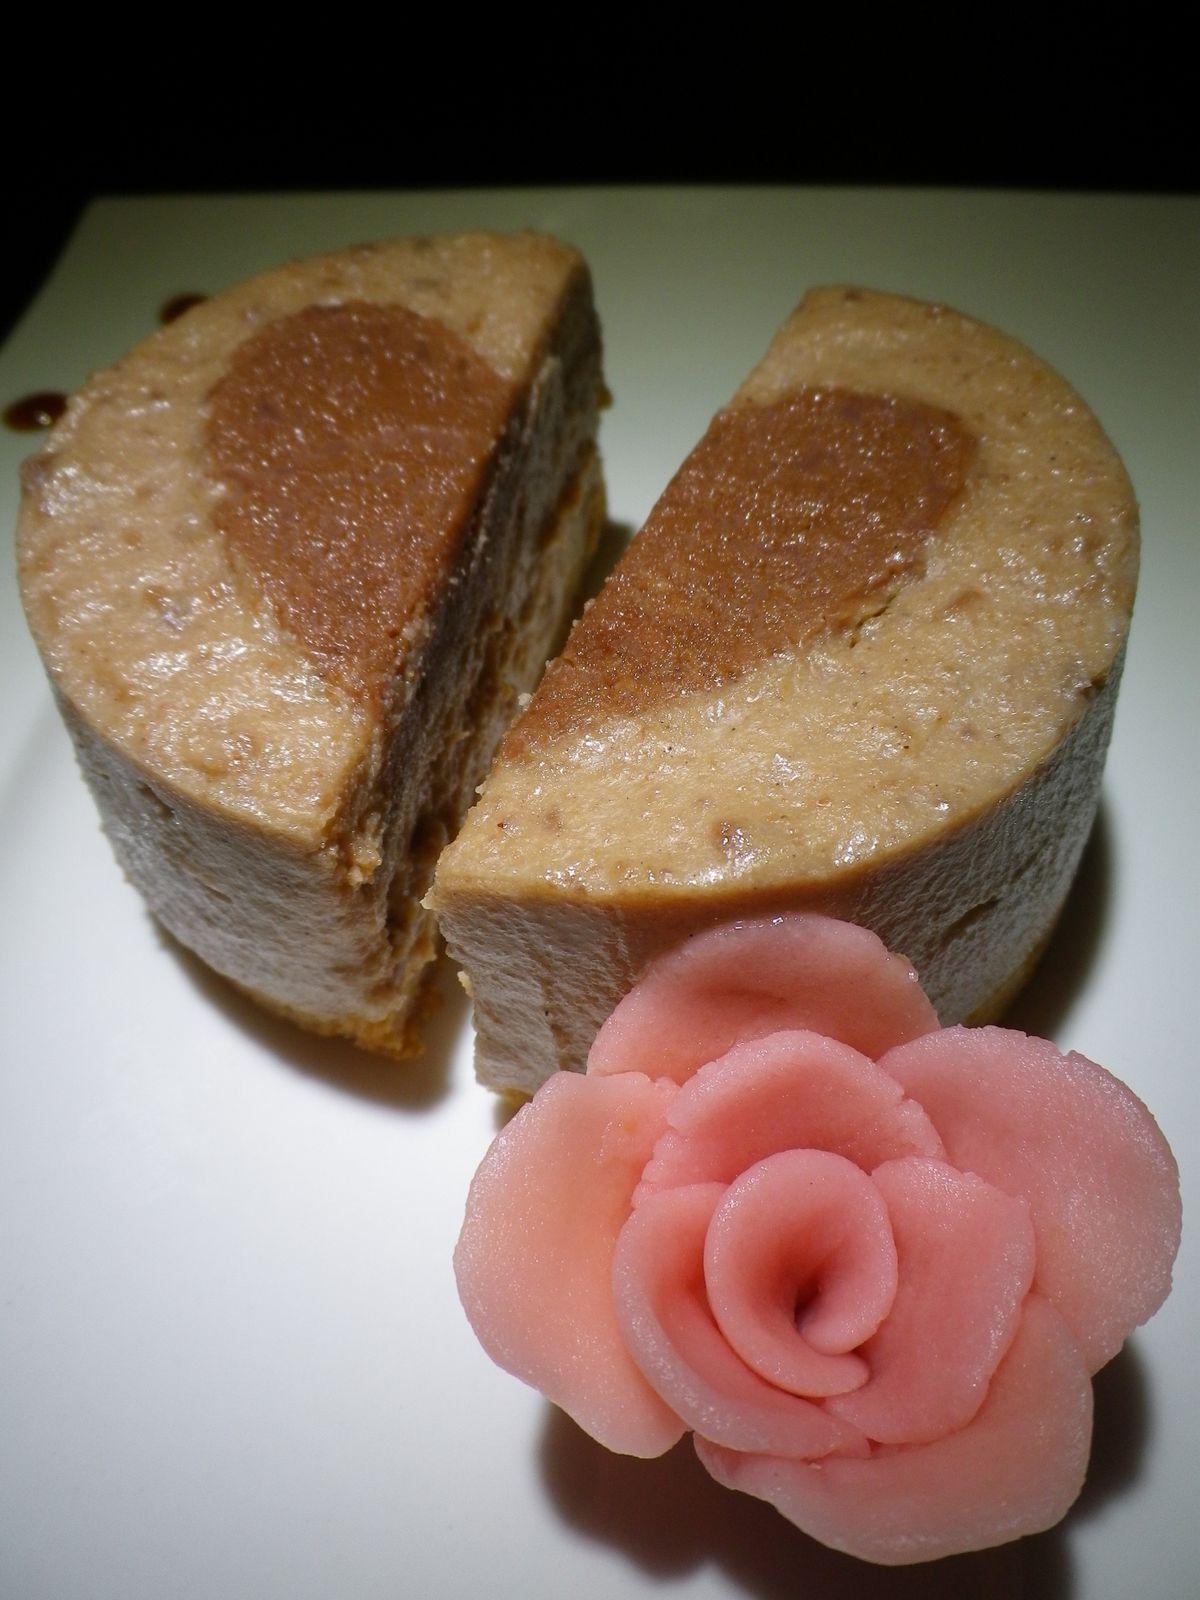 Cheesecake sans cuisson marrons-caramel, cœur St Valentin au chocolat pralinoise